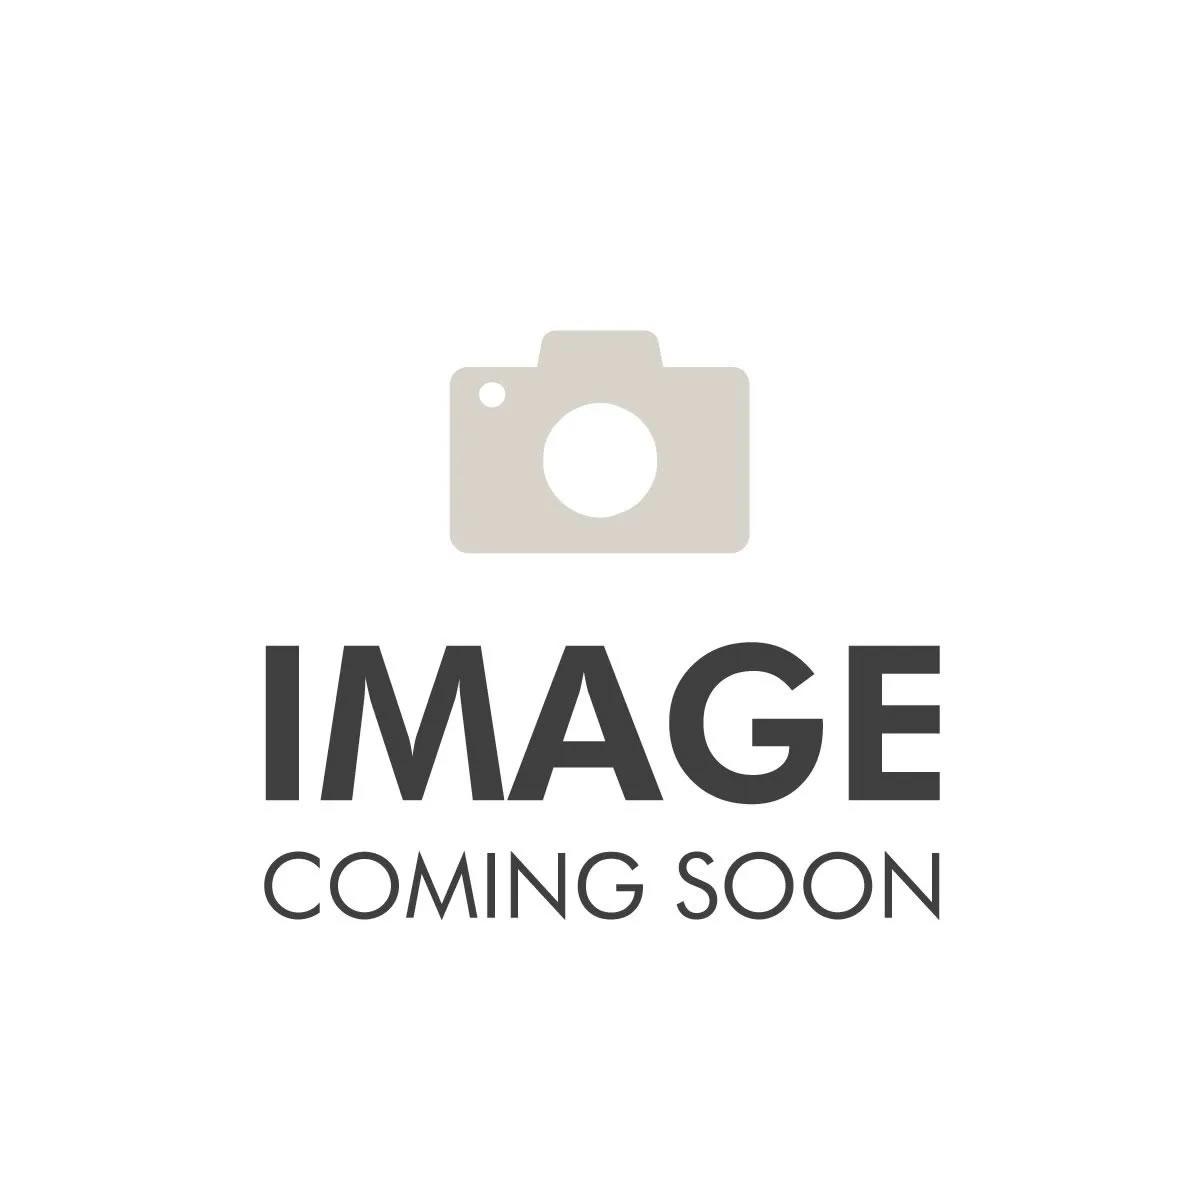 NP231 Replacement Oil Seal Output Shaft, Mega Short SYE Kit